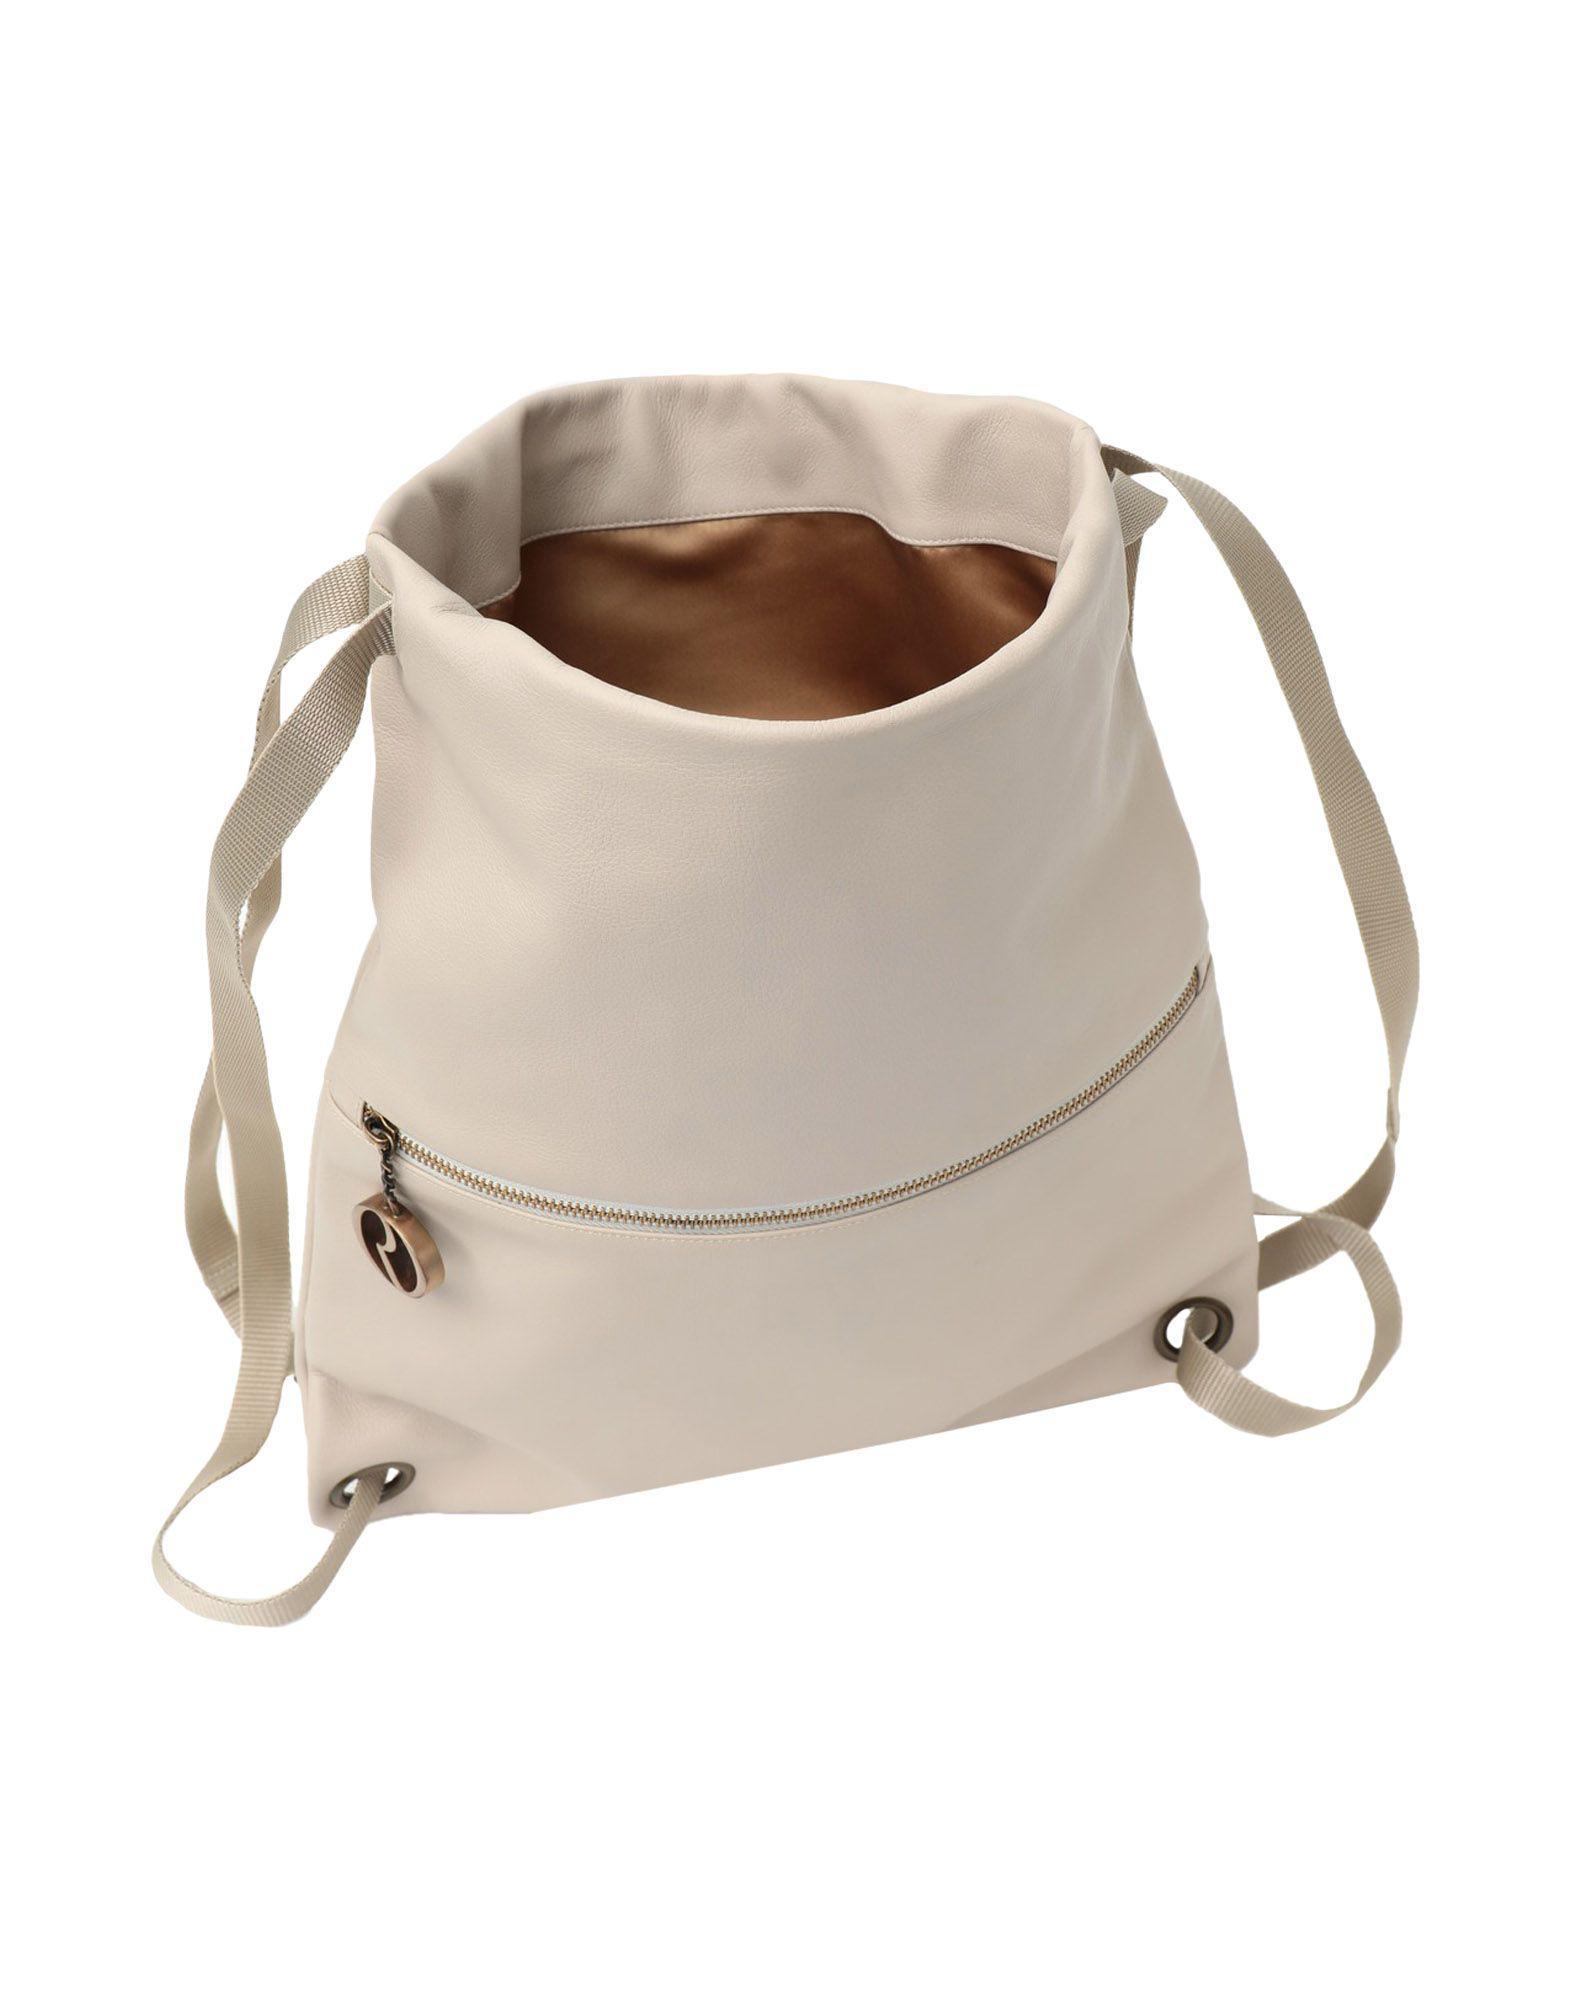 amp; Backpacks Bags Lyst In Bum Rodo Natural 6zRZETq